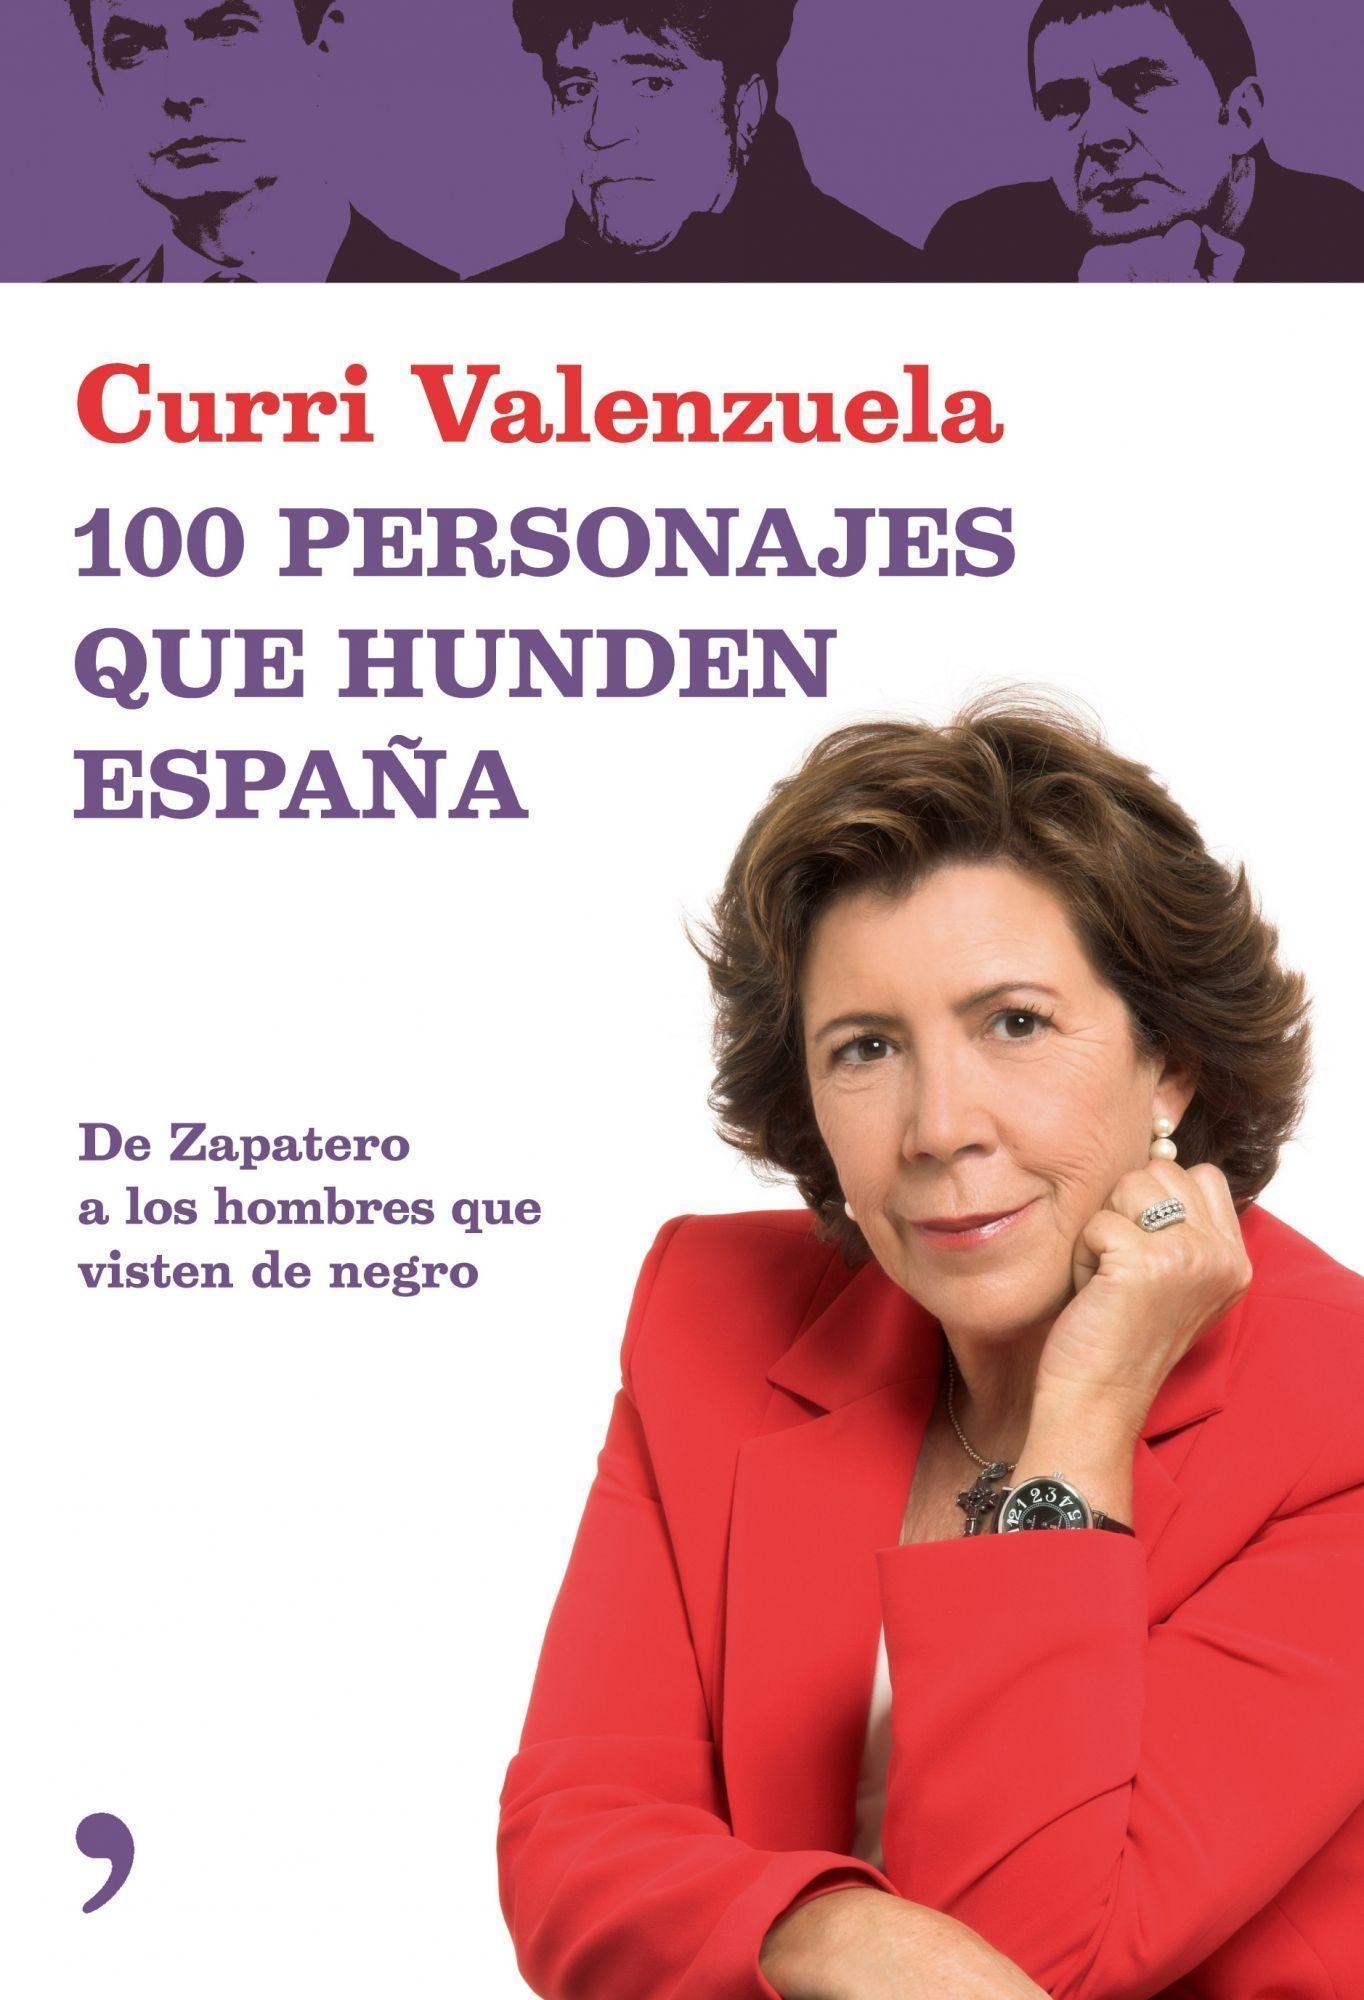 100 Personajes Que Hunden España: De Zapatero A Los Hombres Que Visten De Negro por Curri Valenzuela